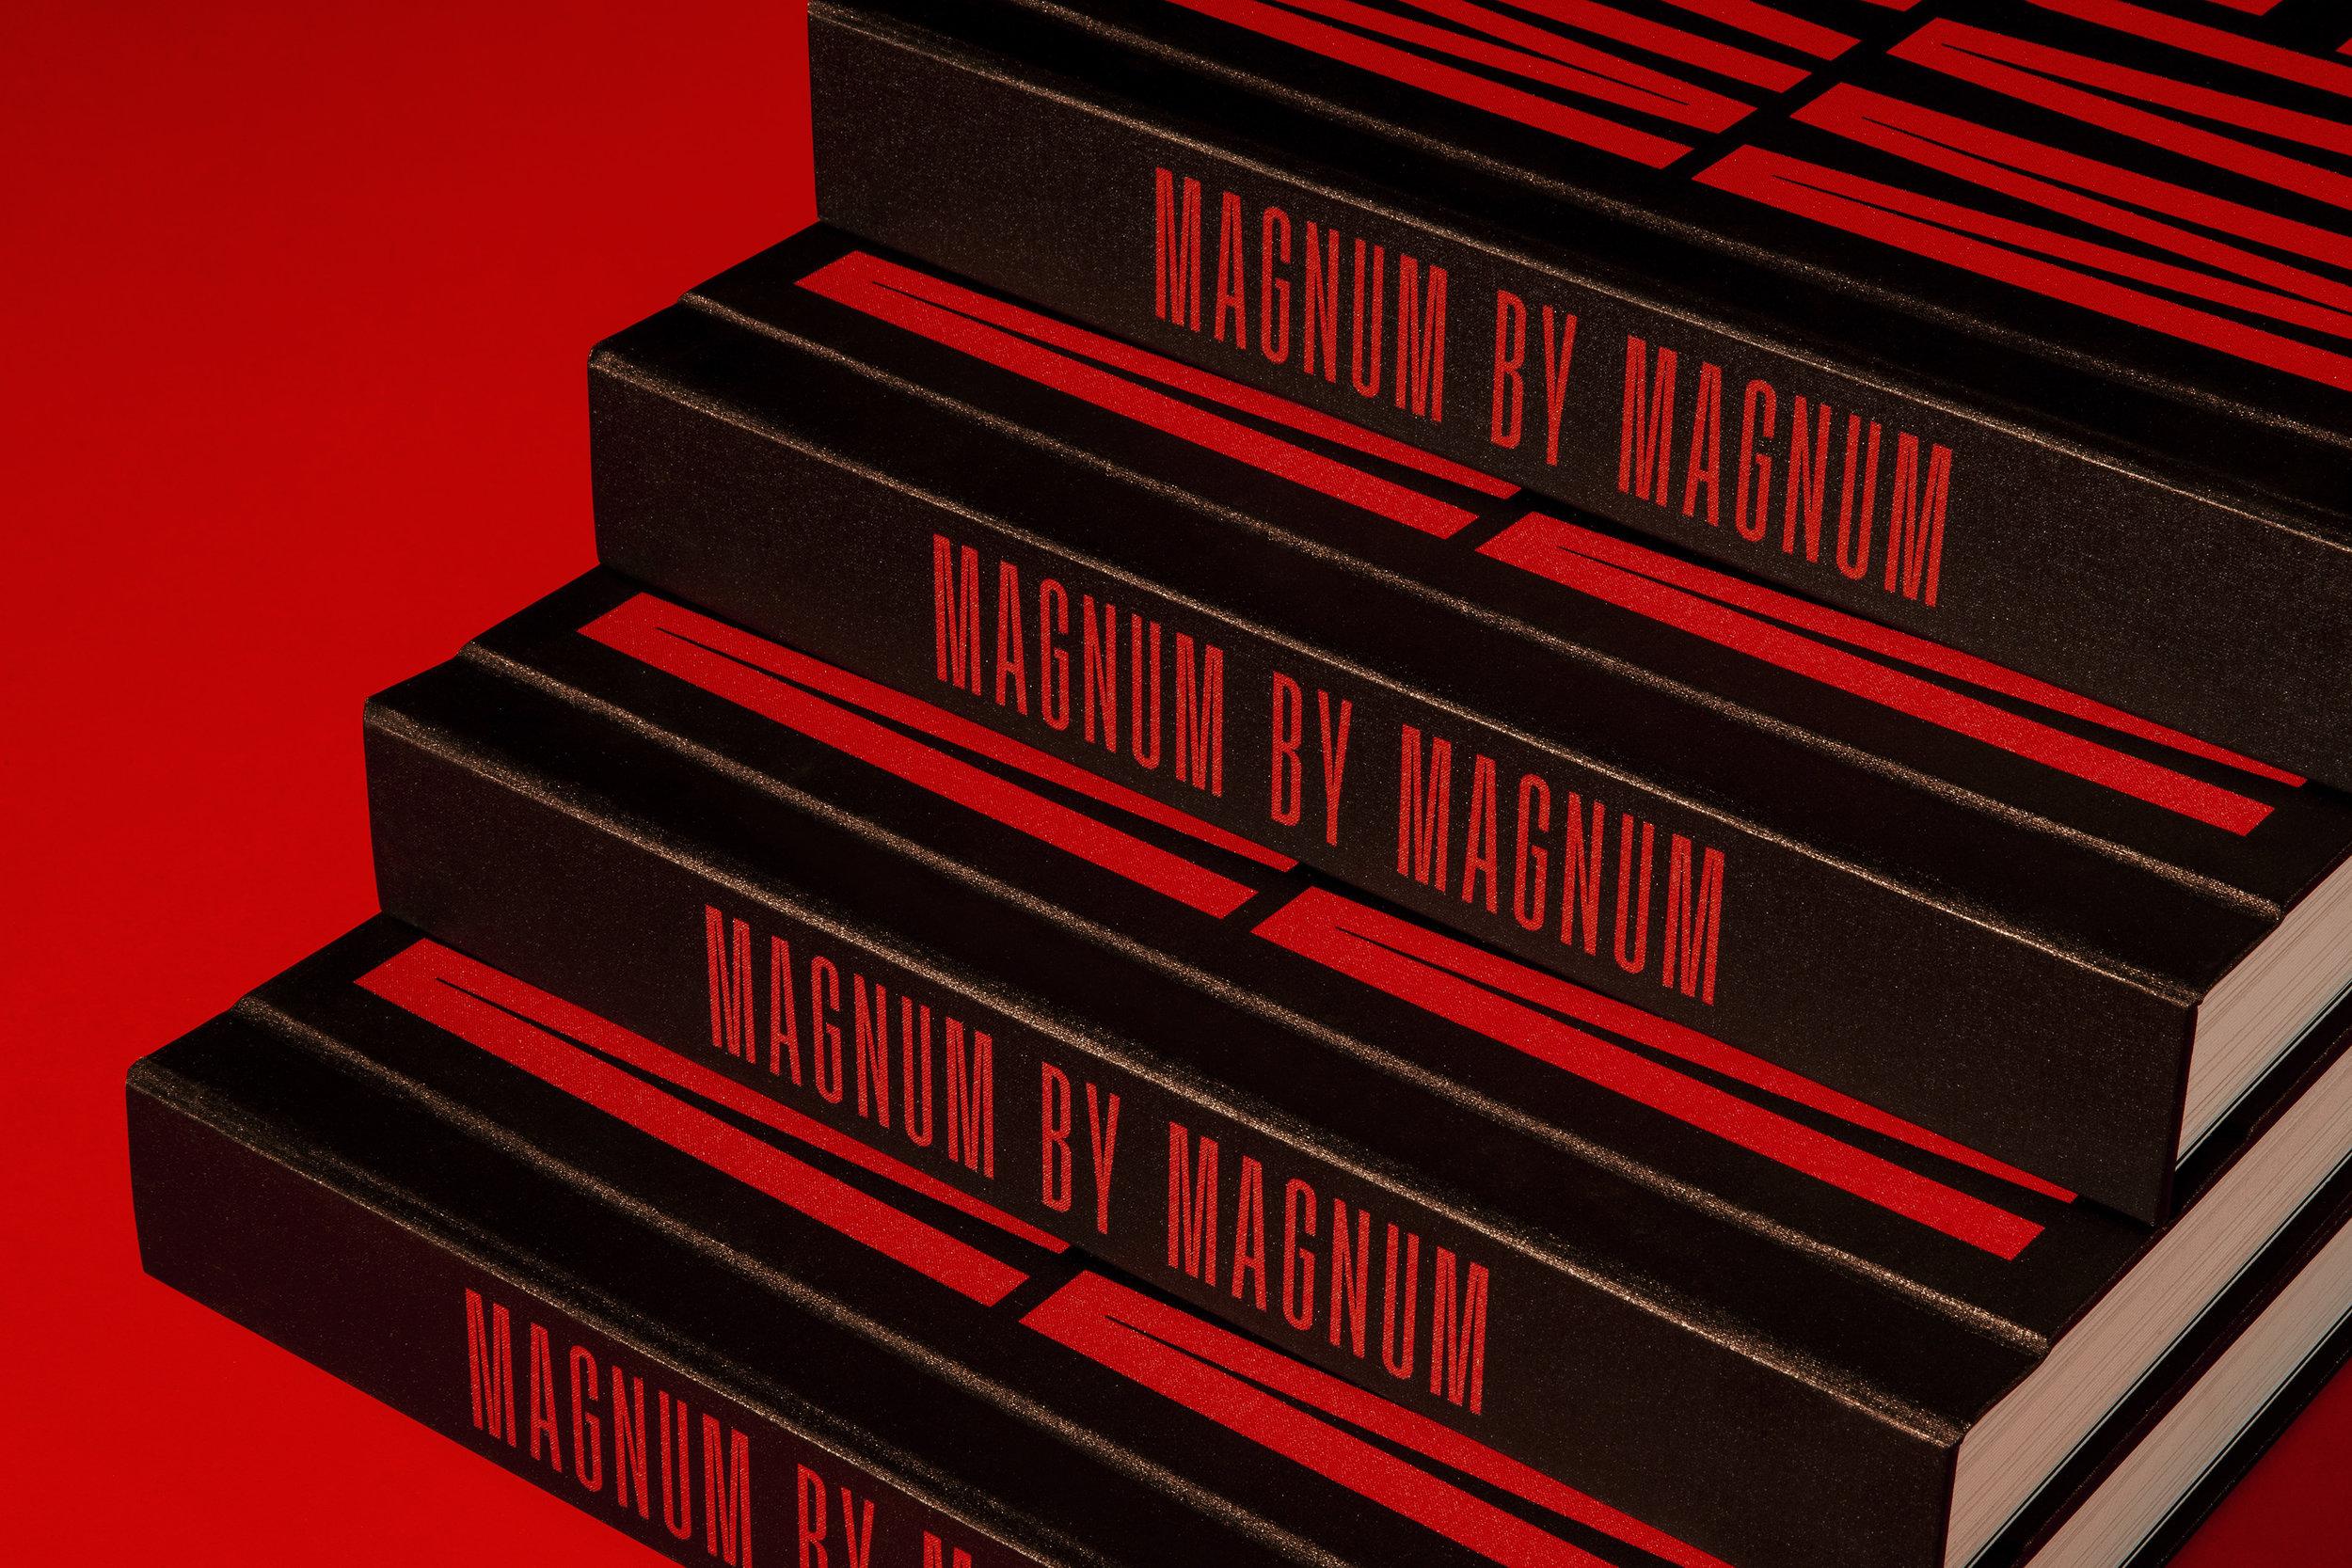 magnum-by-magnum-book5.jpg